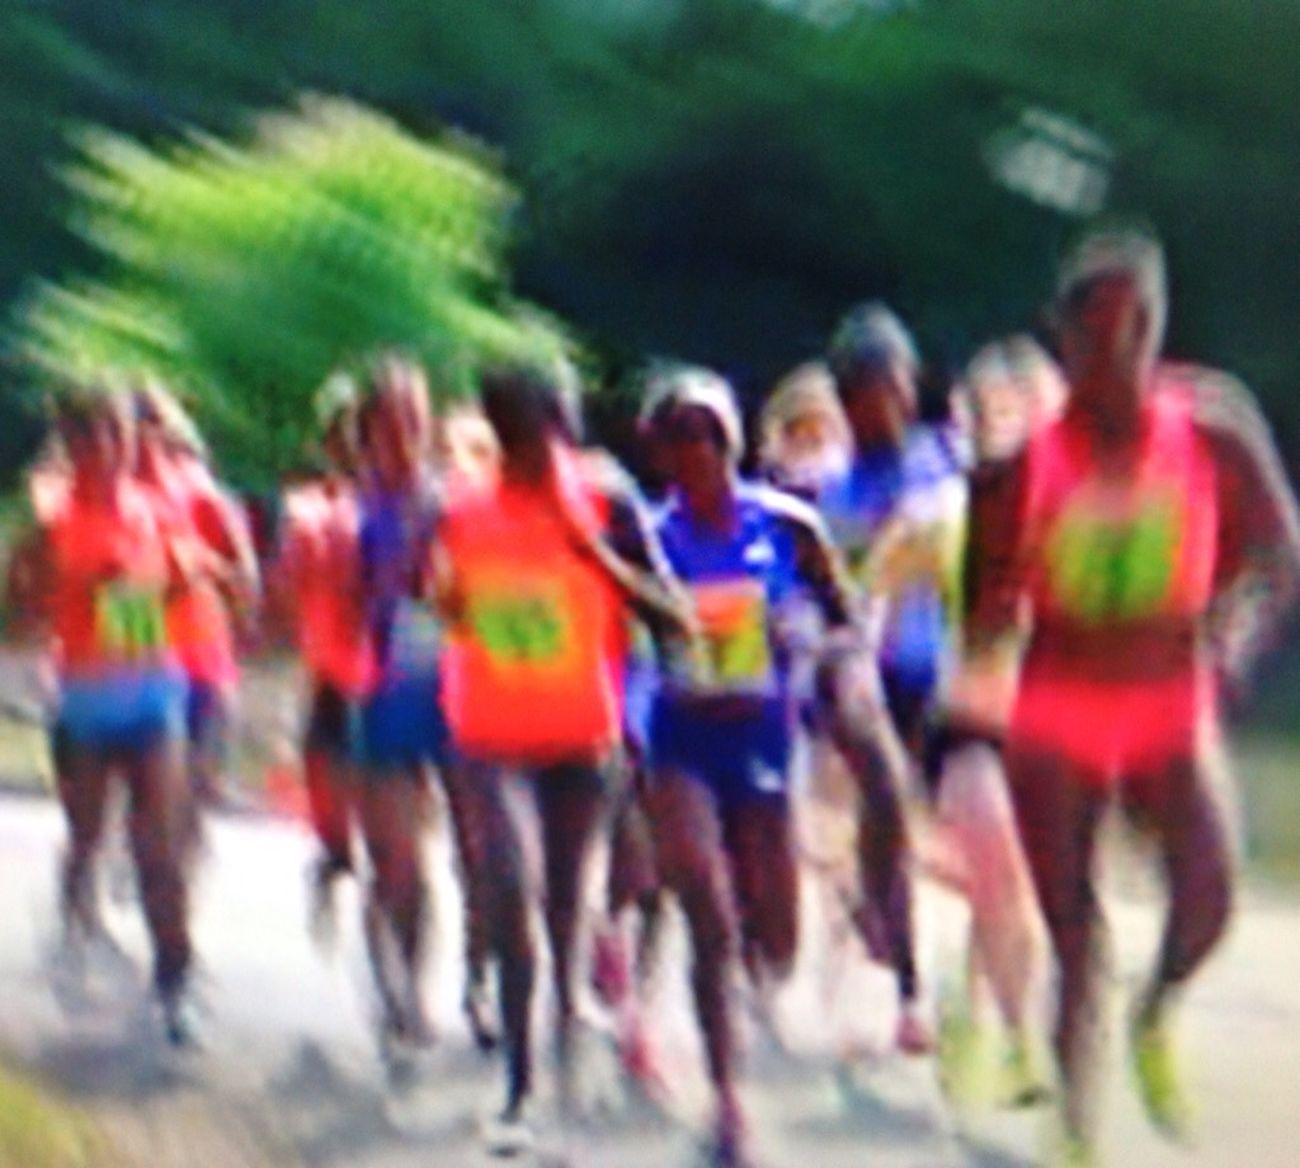 Capturing Movement ©Ann Rigley IoLIGHTstudios  Runners